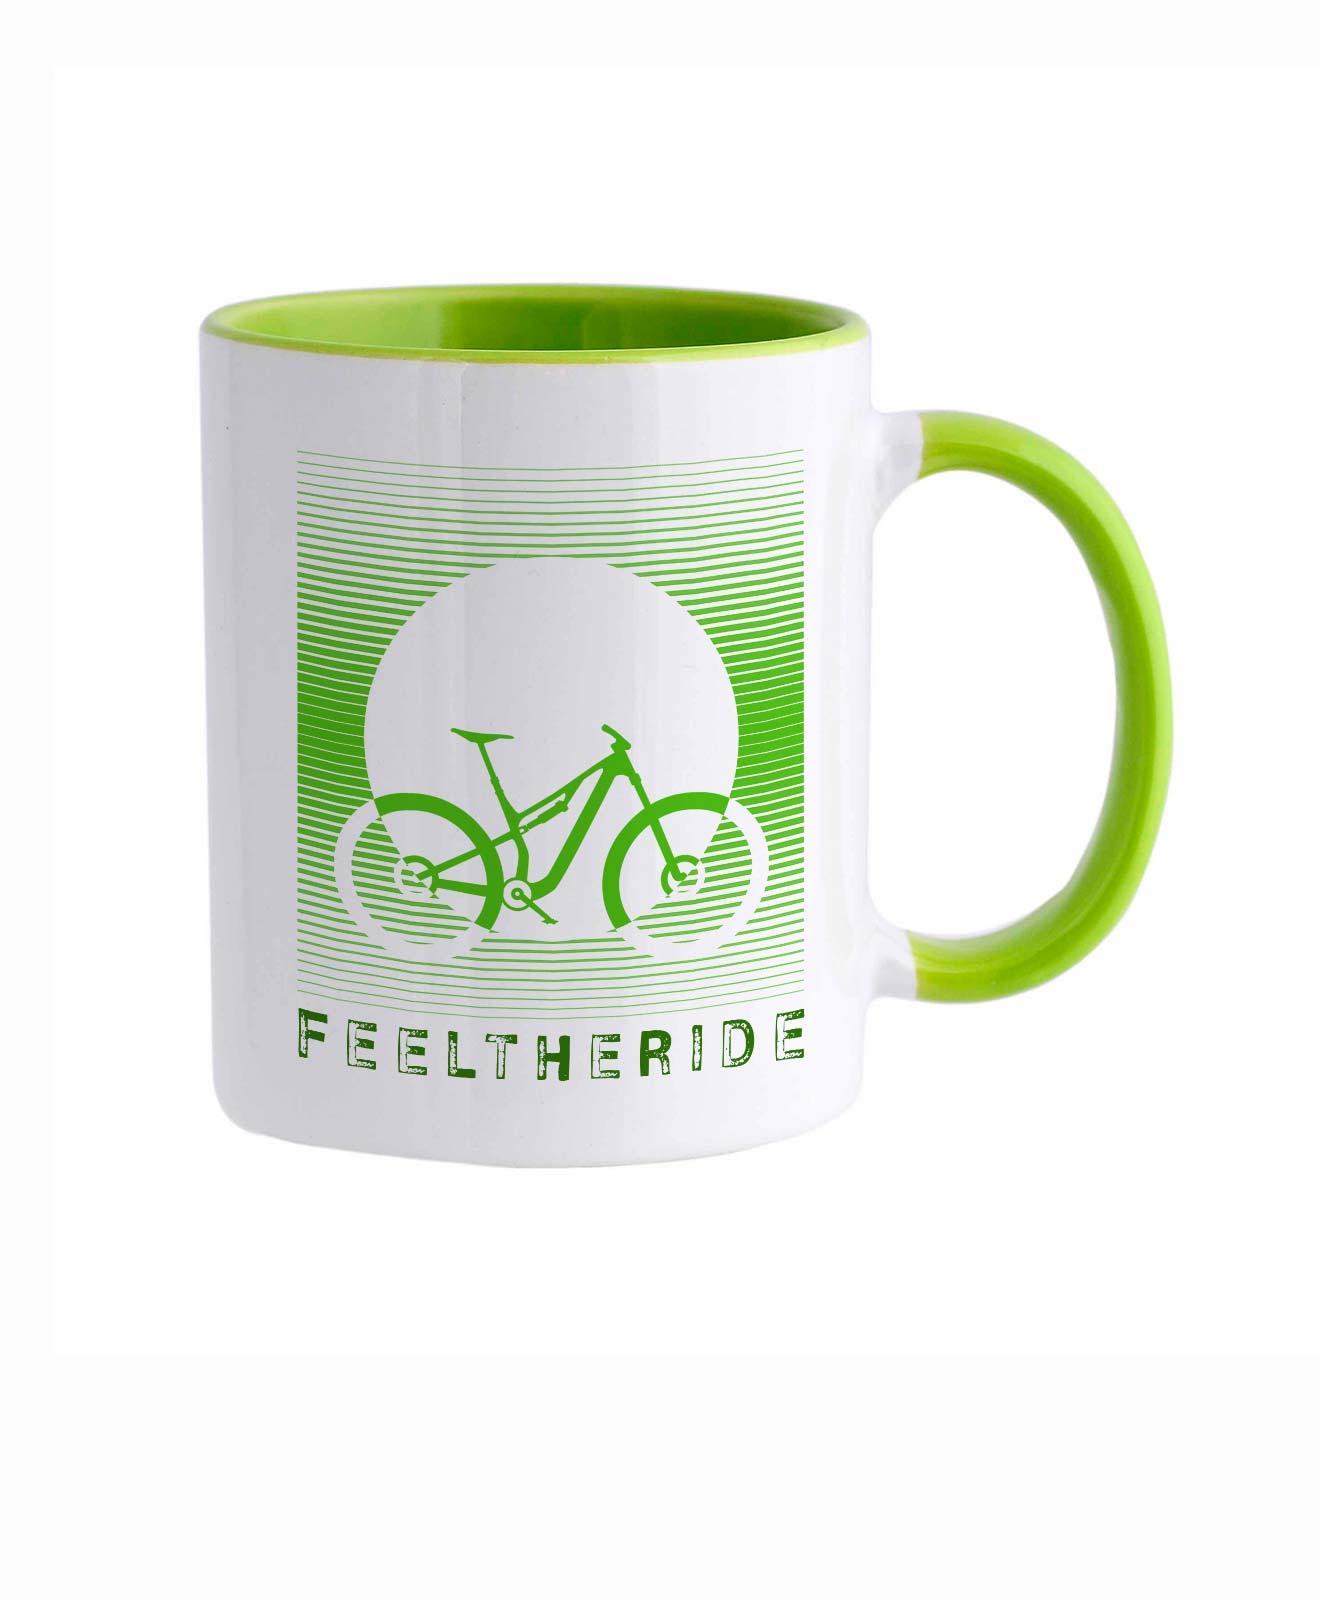 Feel the ride with your bike Mug MTB Green